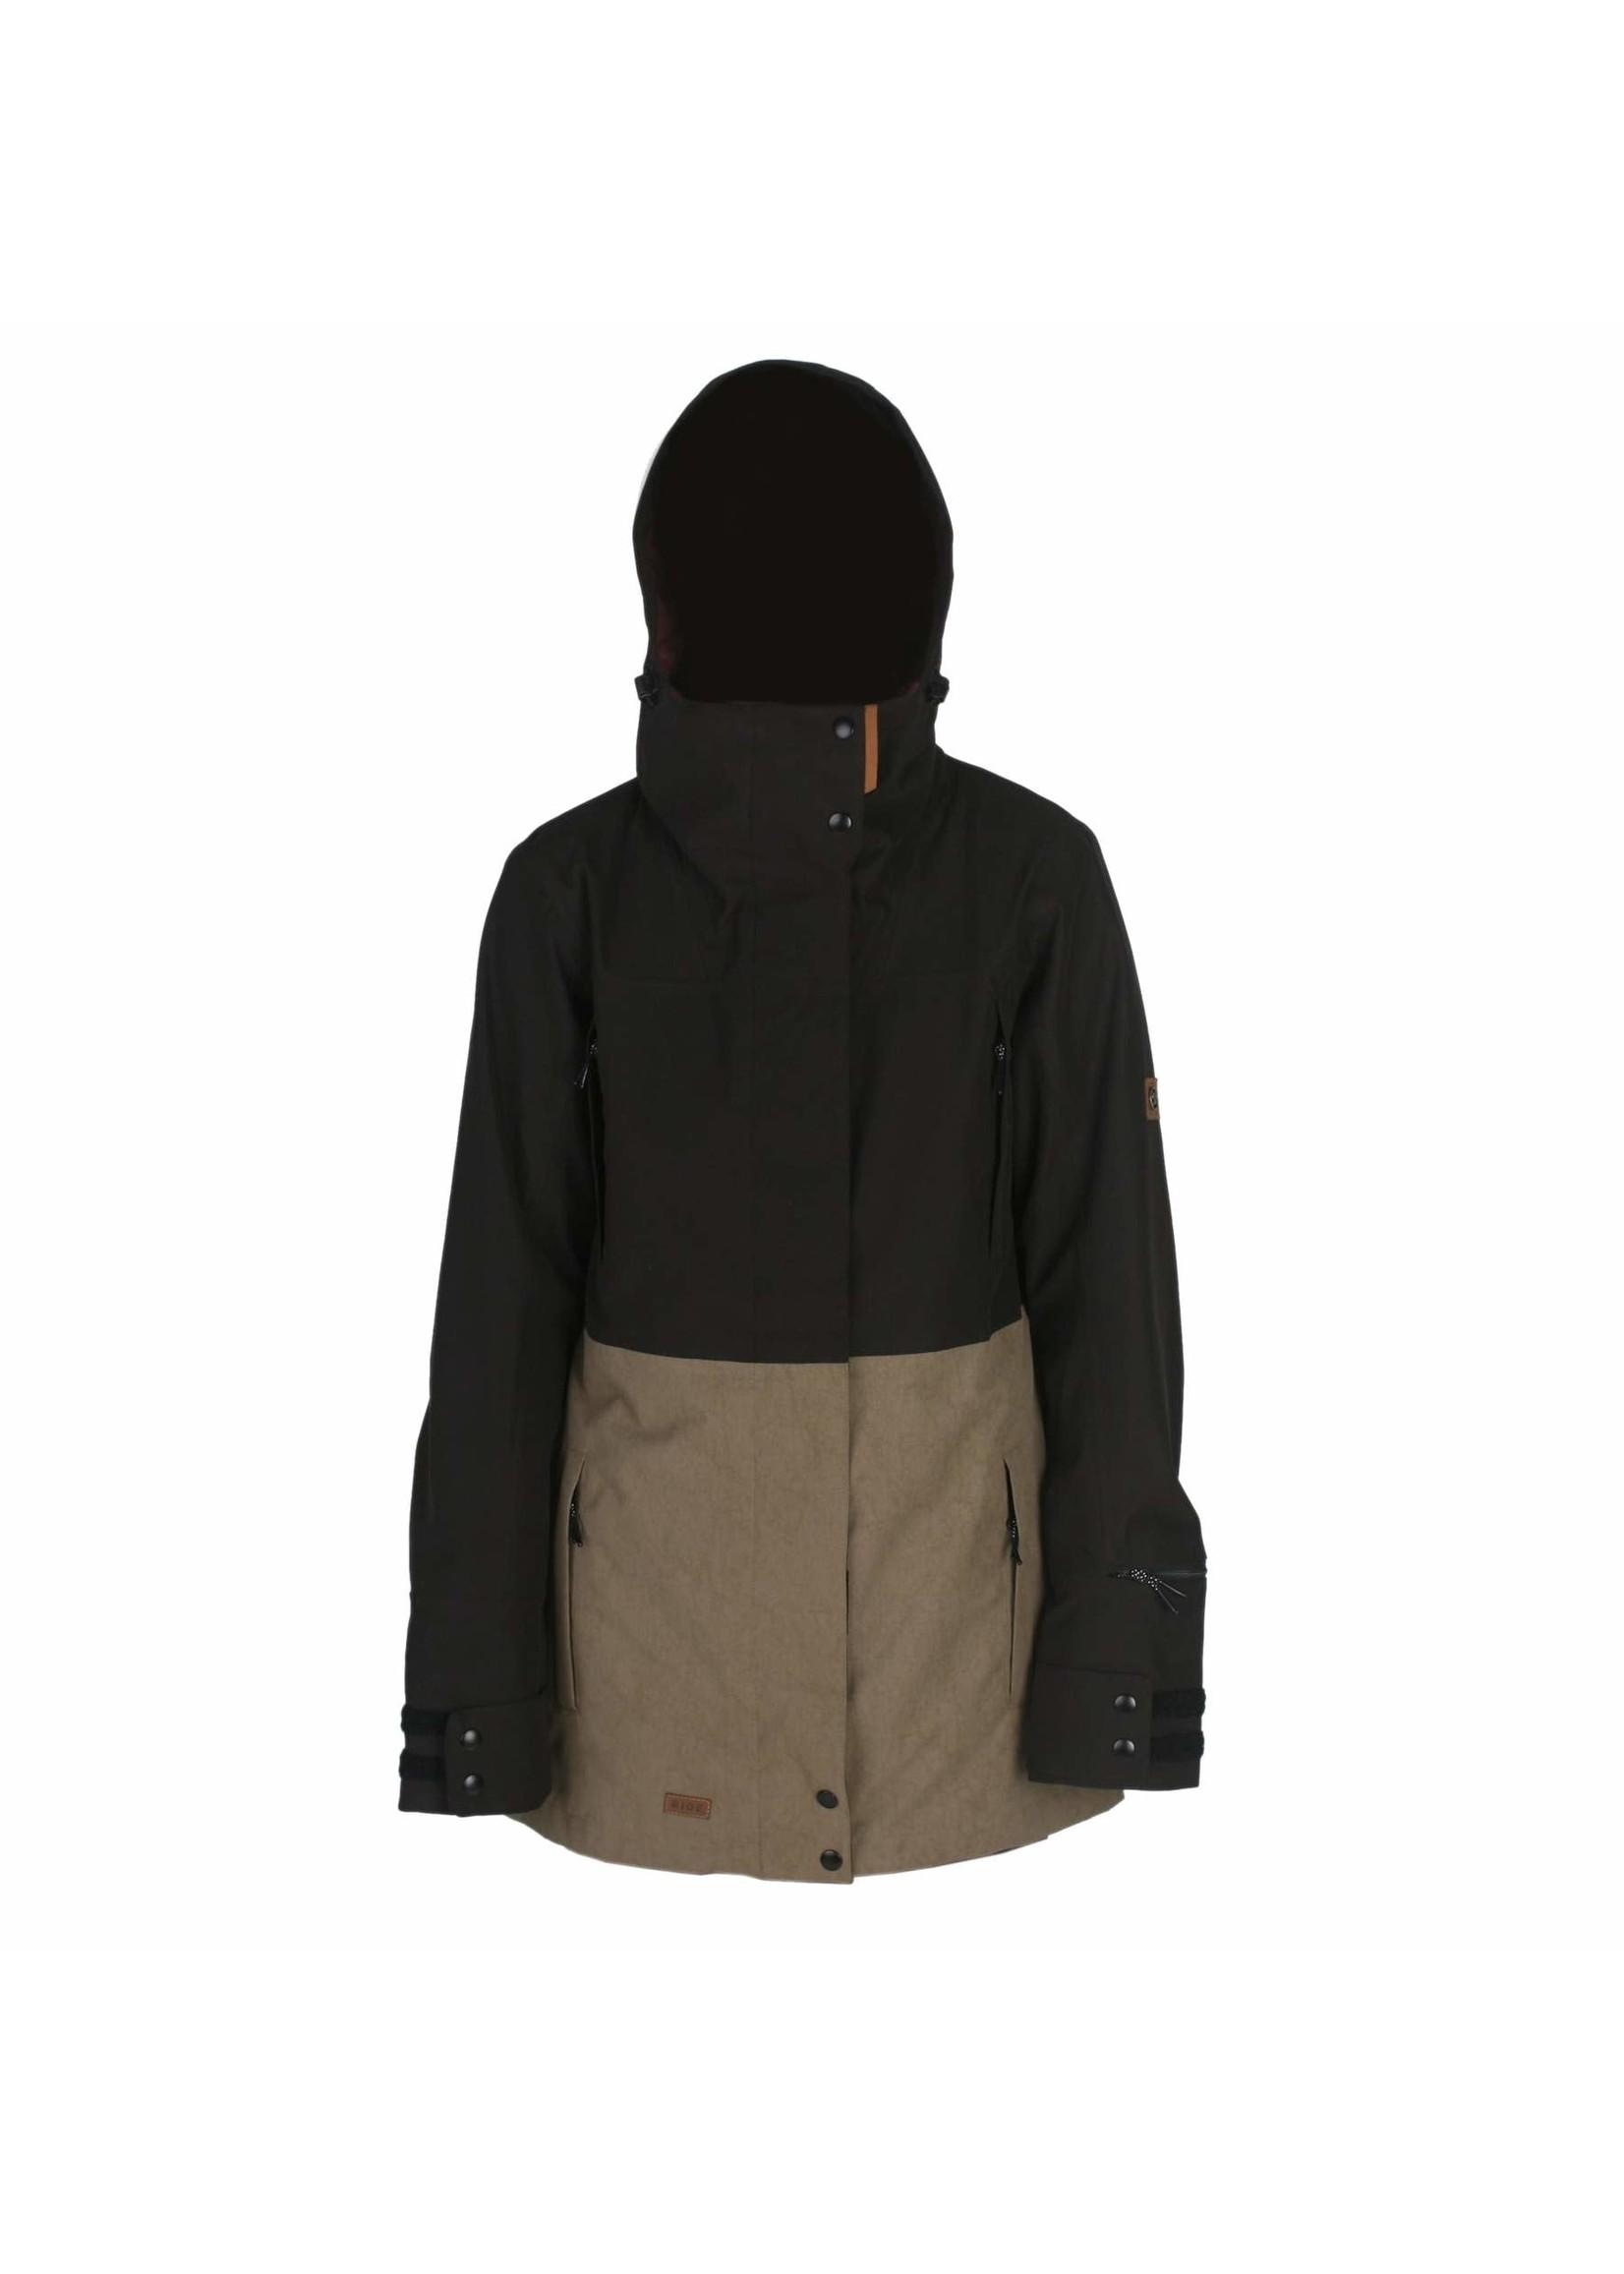 Ride Ravenna Jacket-Insulated XS